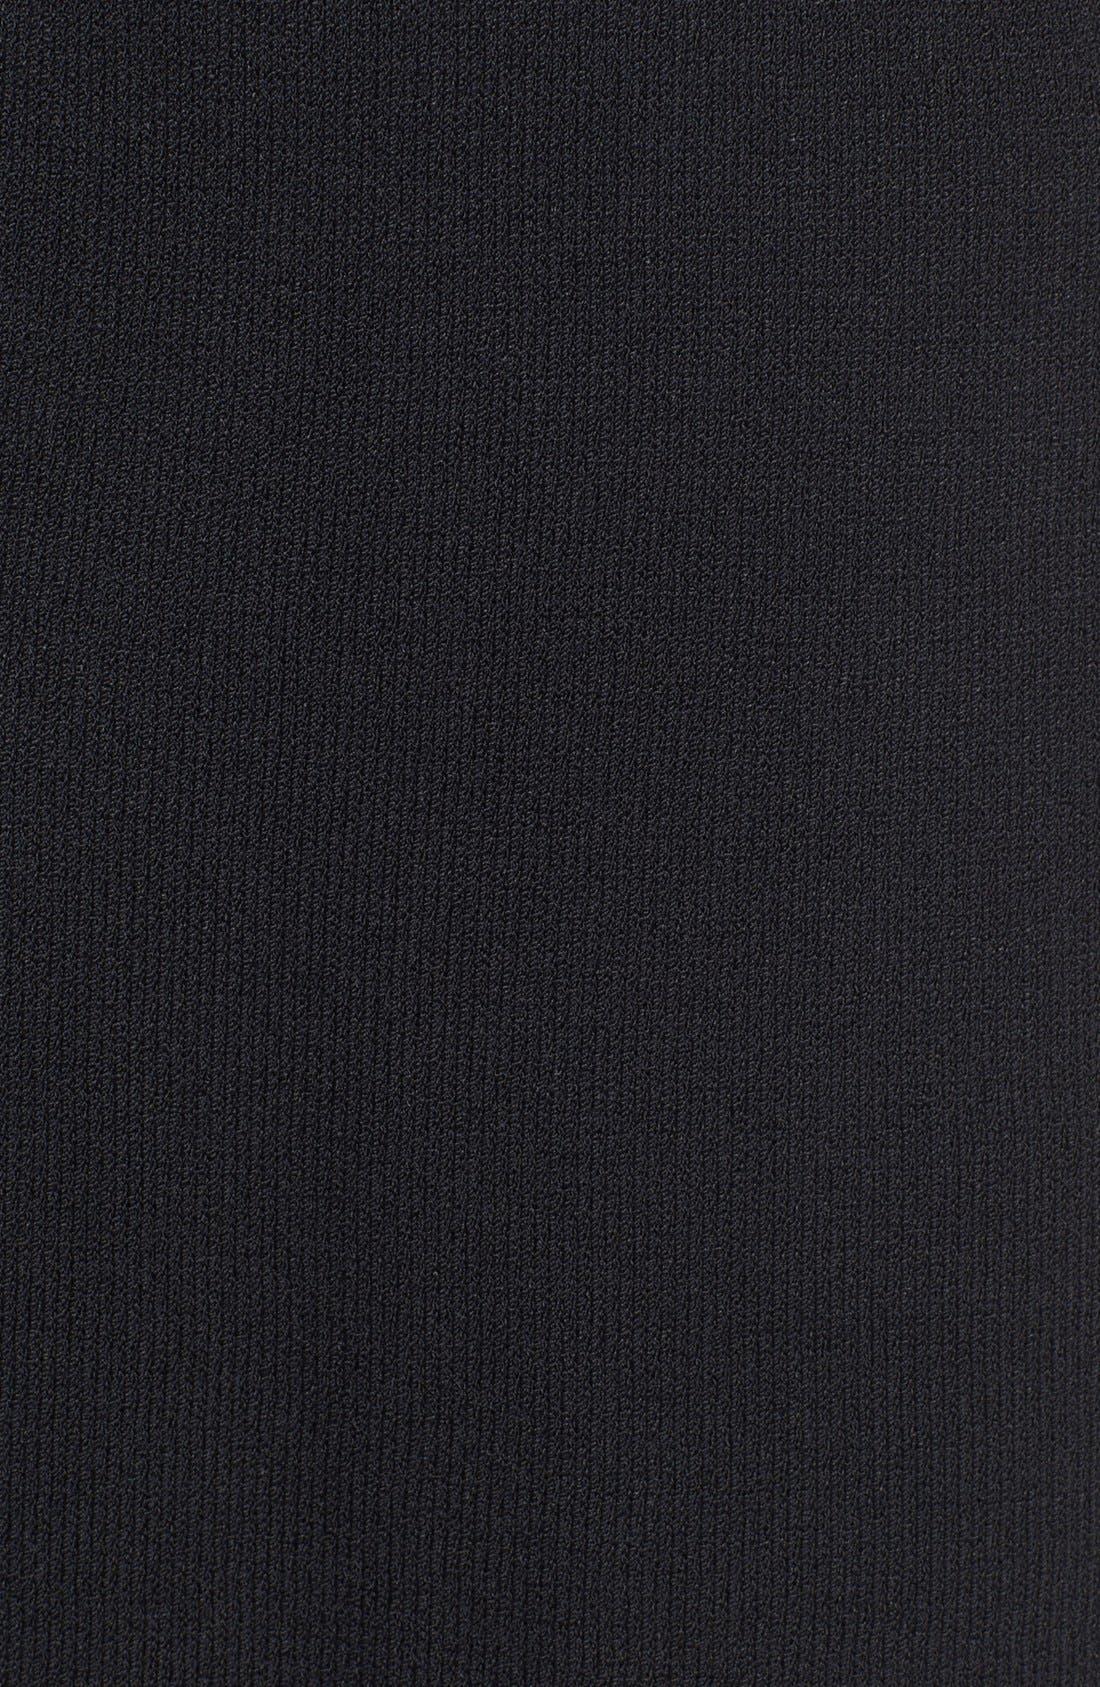 ST. JOHN COLLECTION,                             Santana Knit Skirt,                             Alternate thumbnail 5, color,                             001